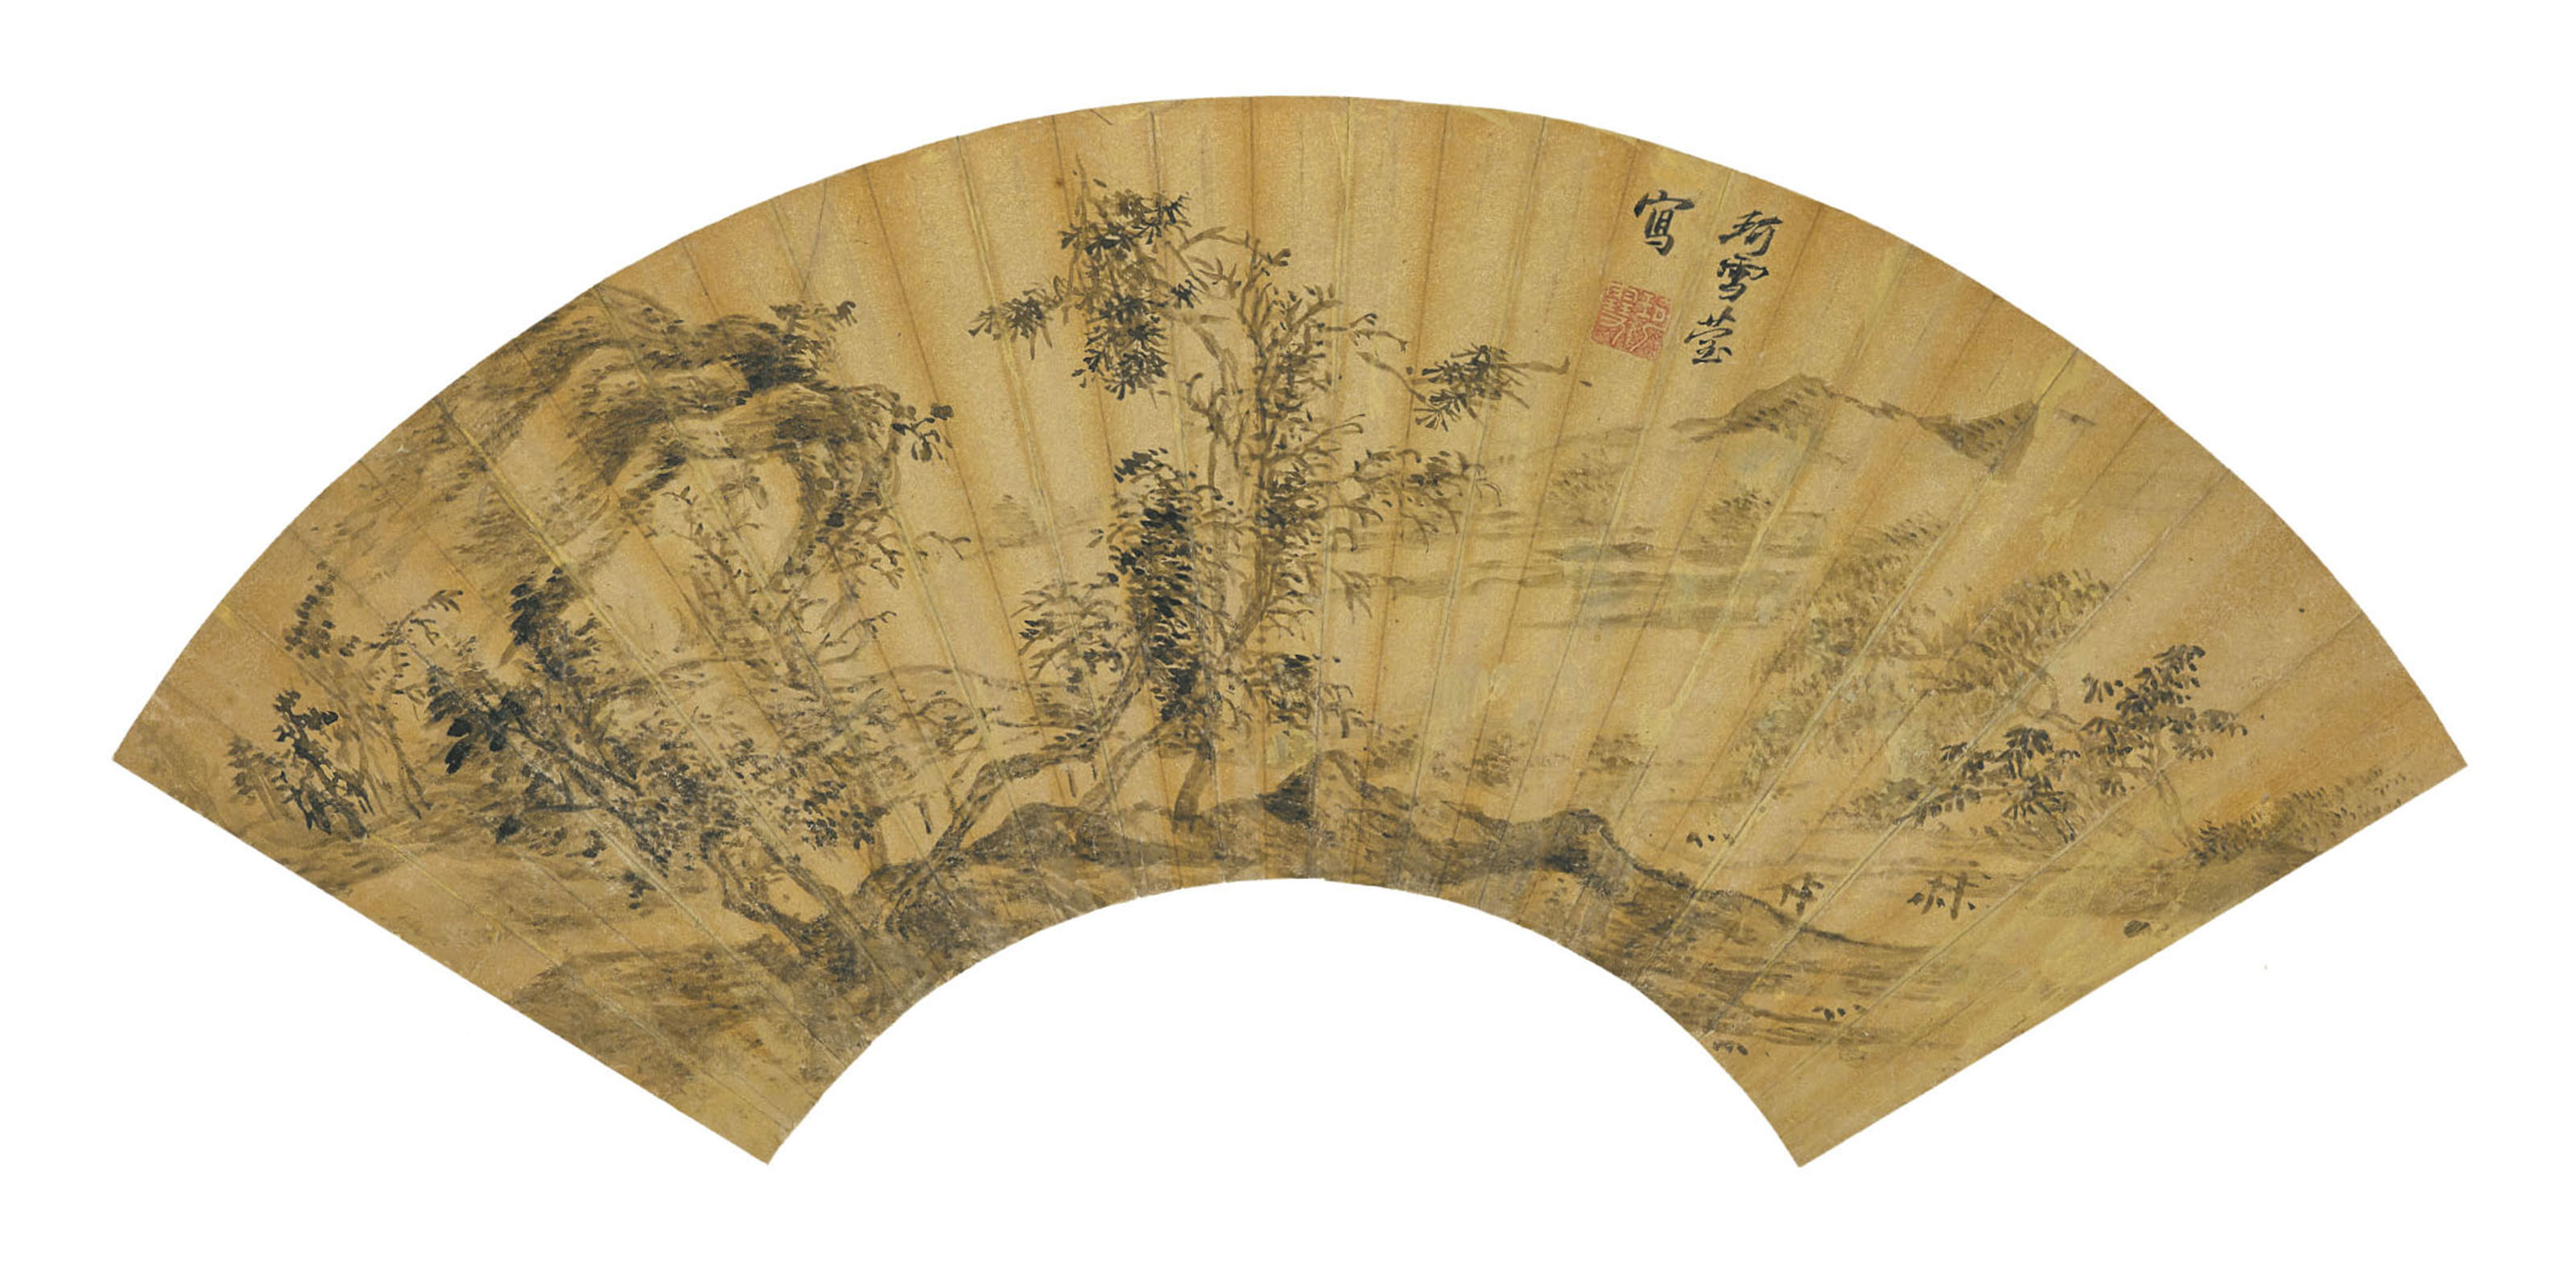 LI ZHAOHENG (1592-1644)